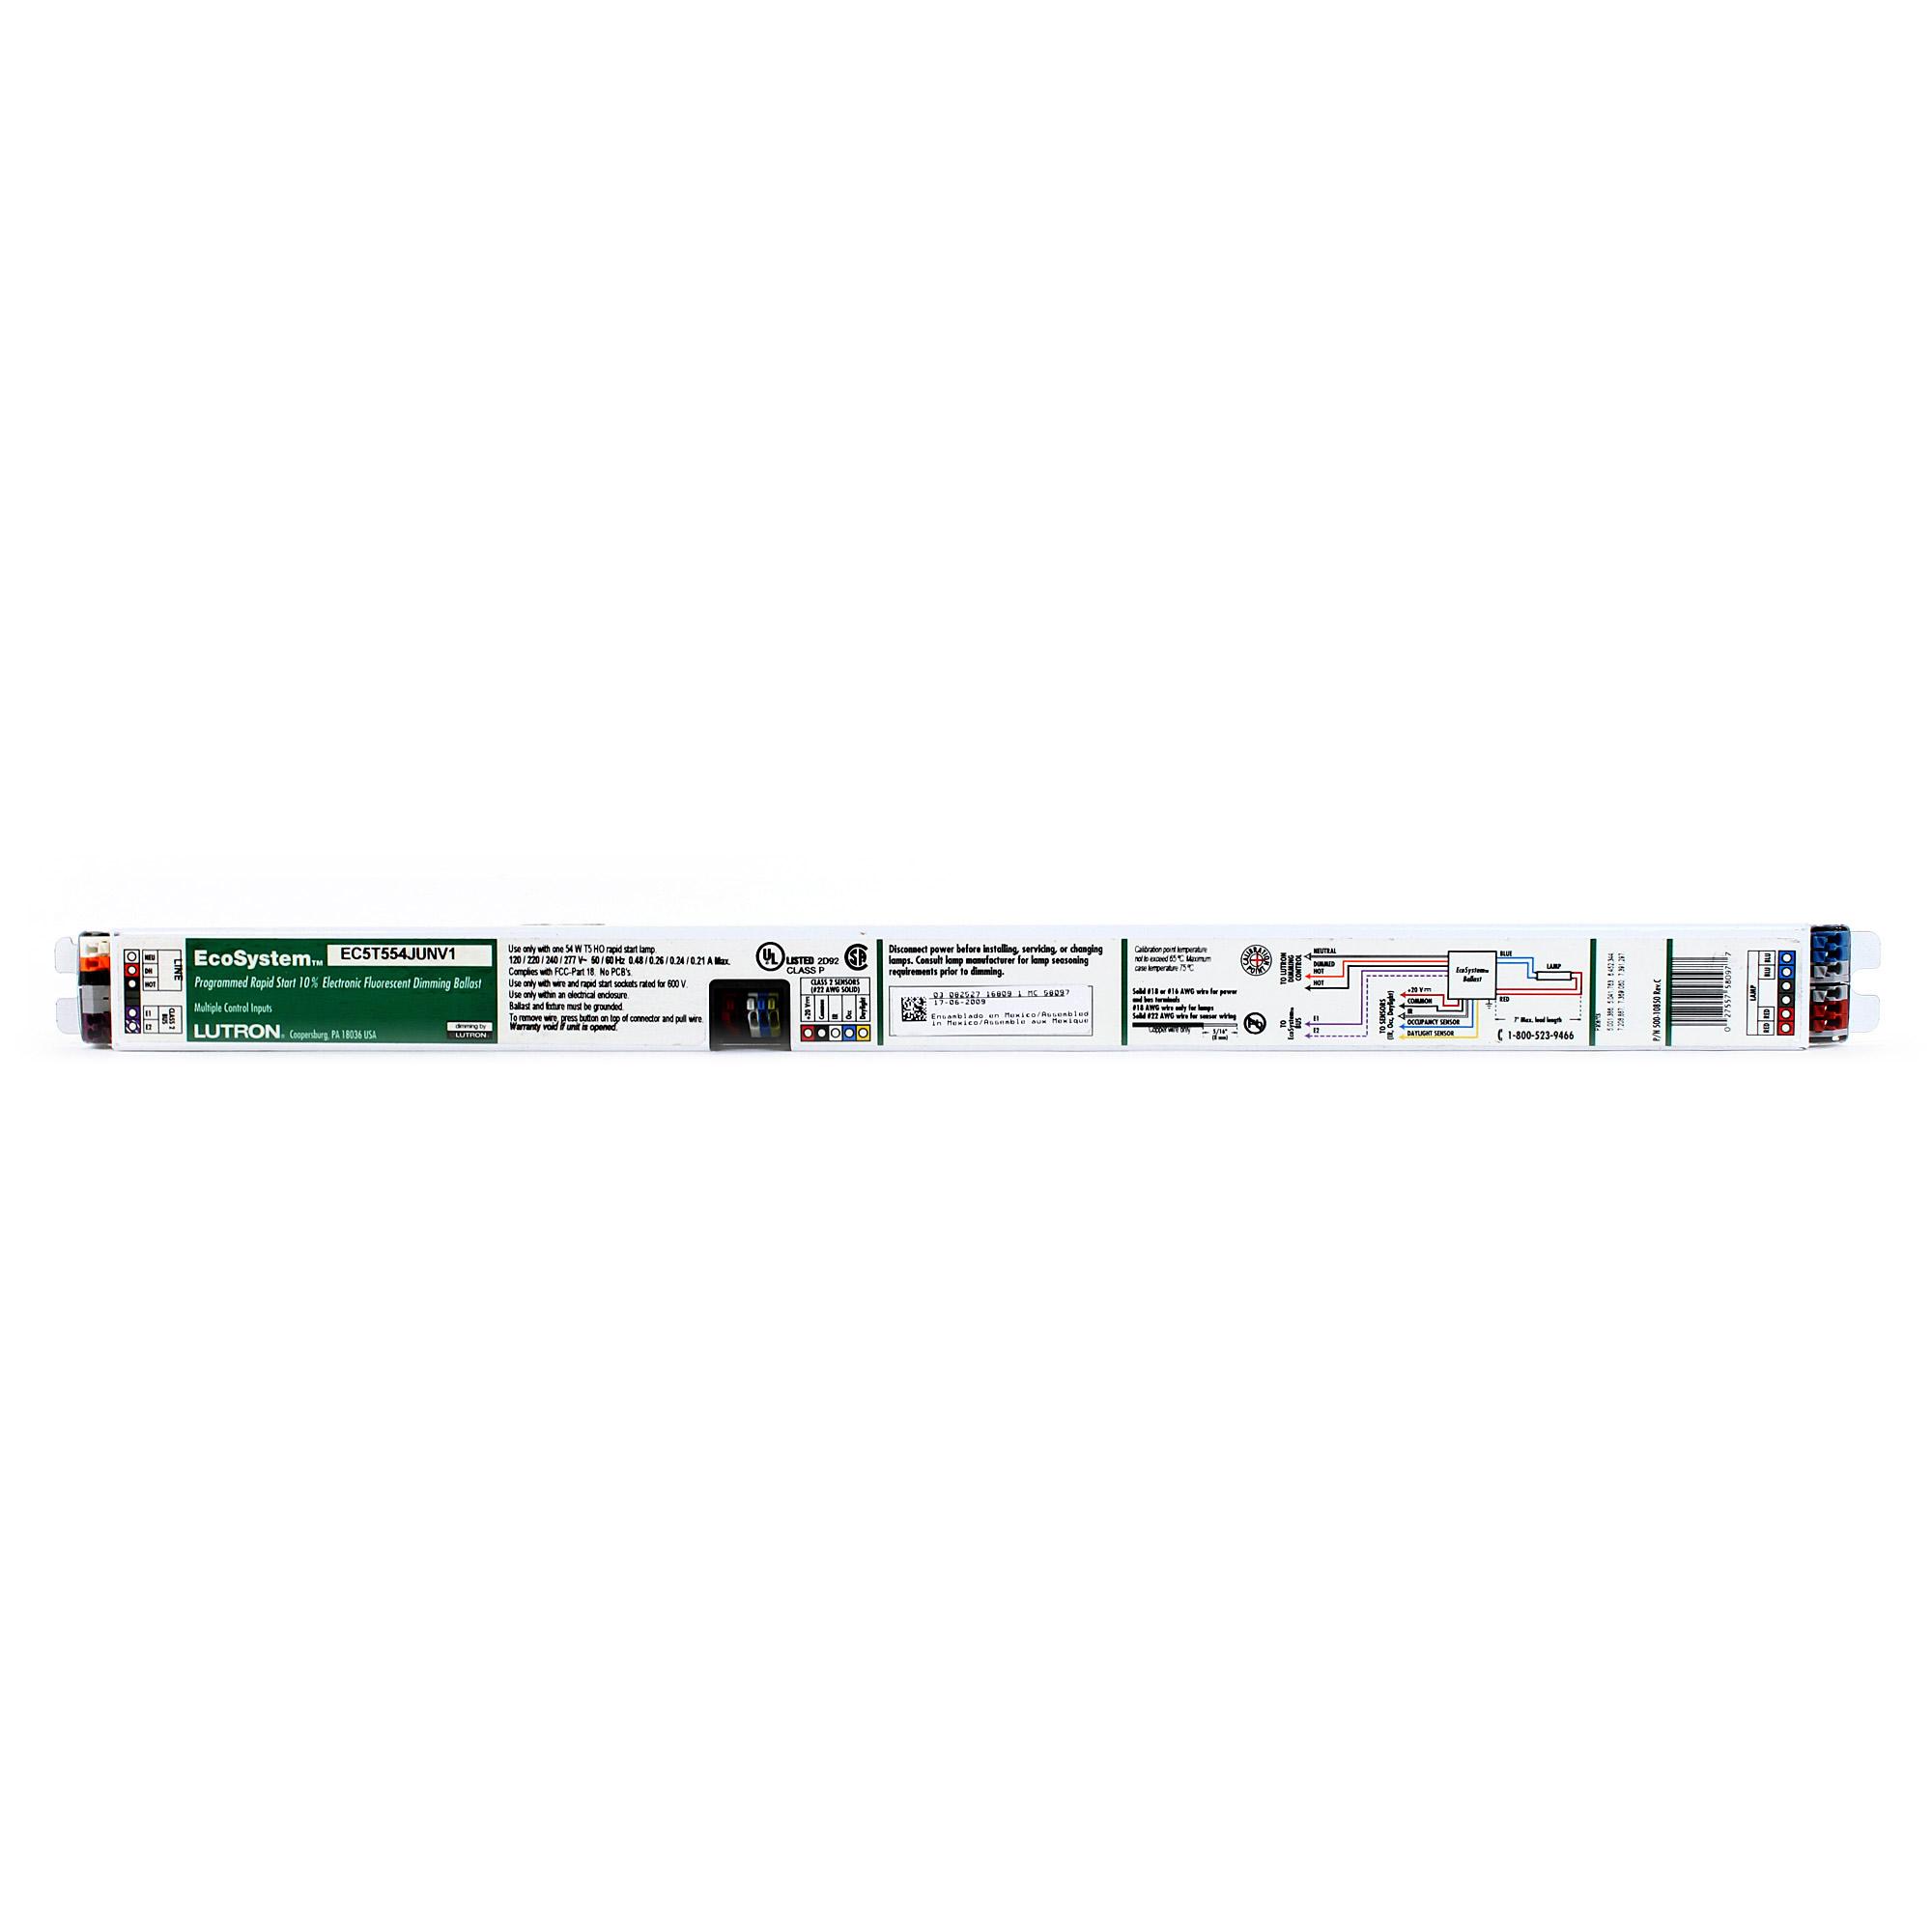 fluorescent dimming ballast wiring diagram simple room lutron ec5t554junv1 eco t5ho